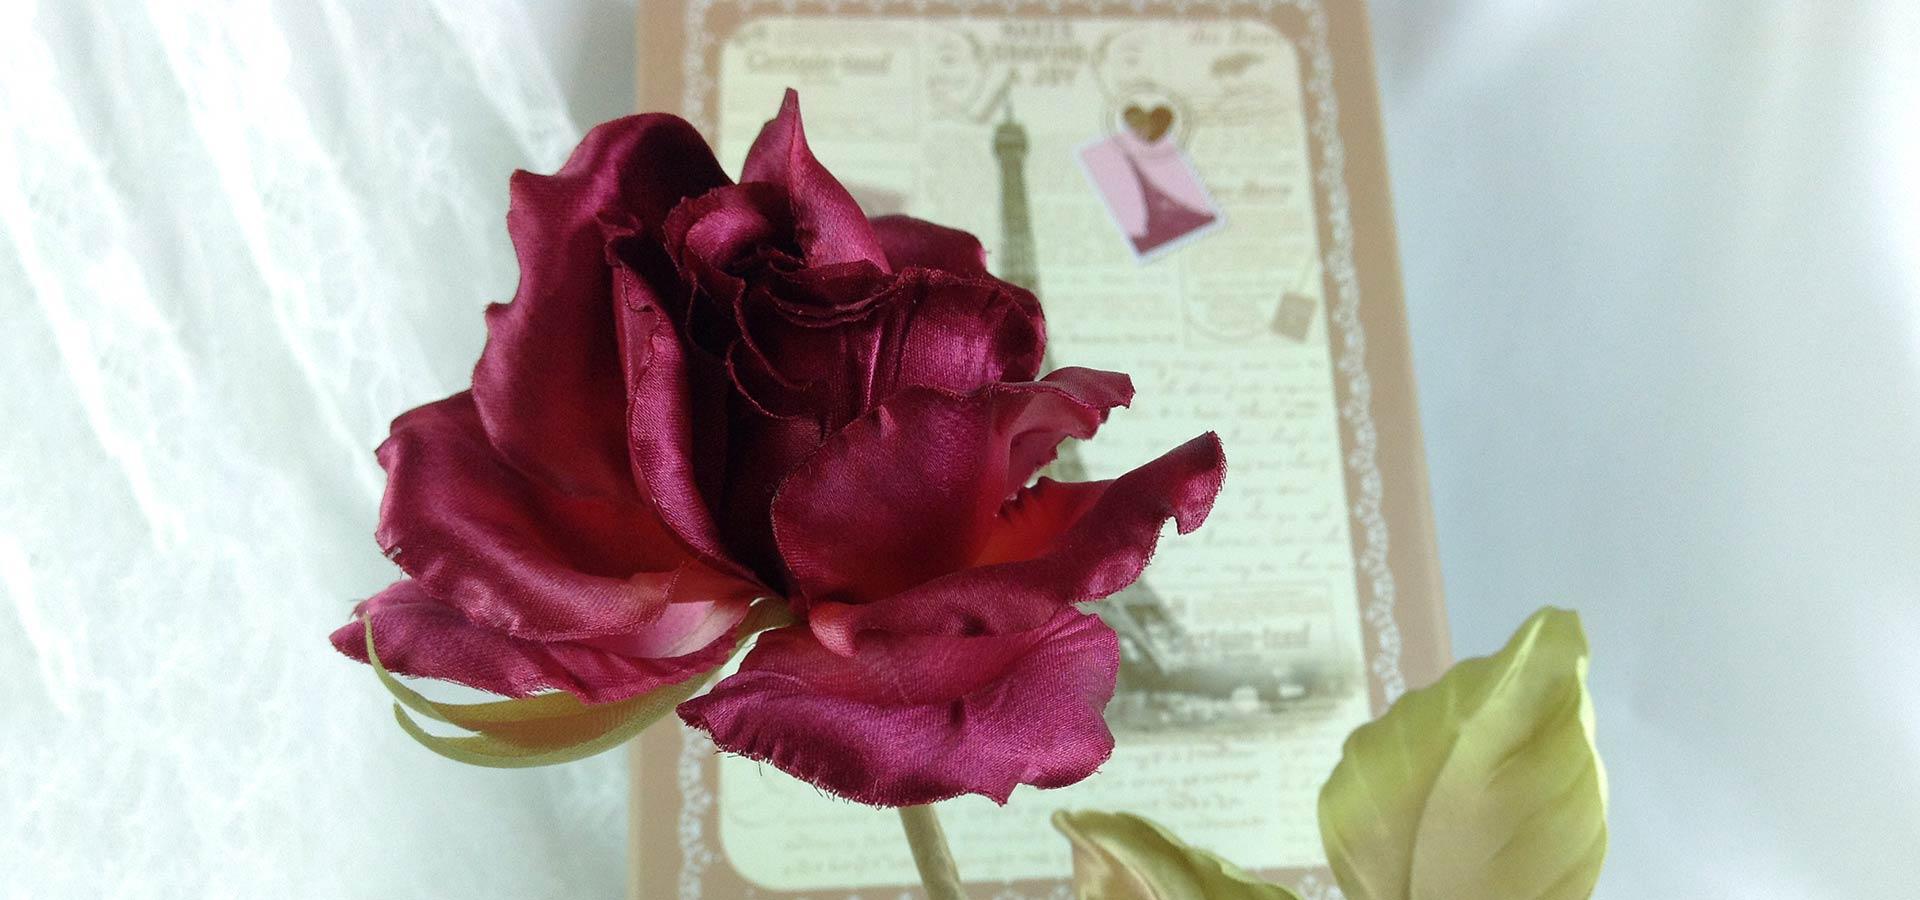 fr-silk-rose-marsel-paniol